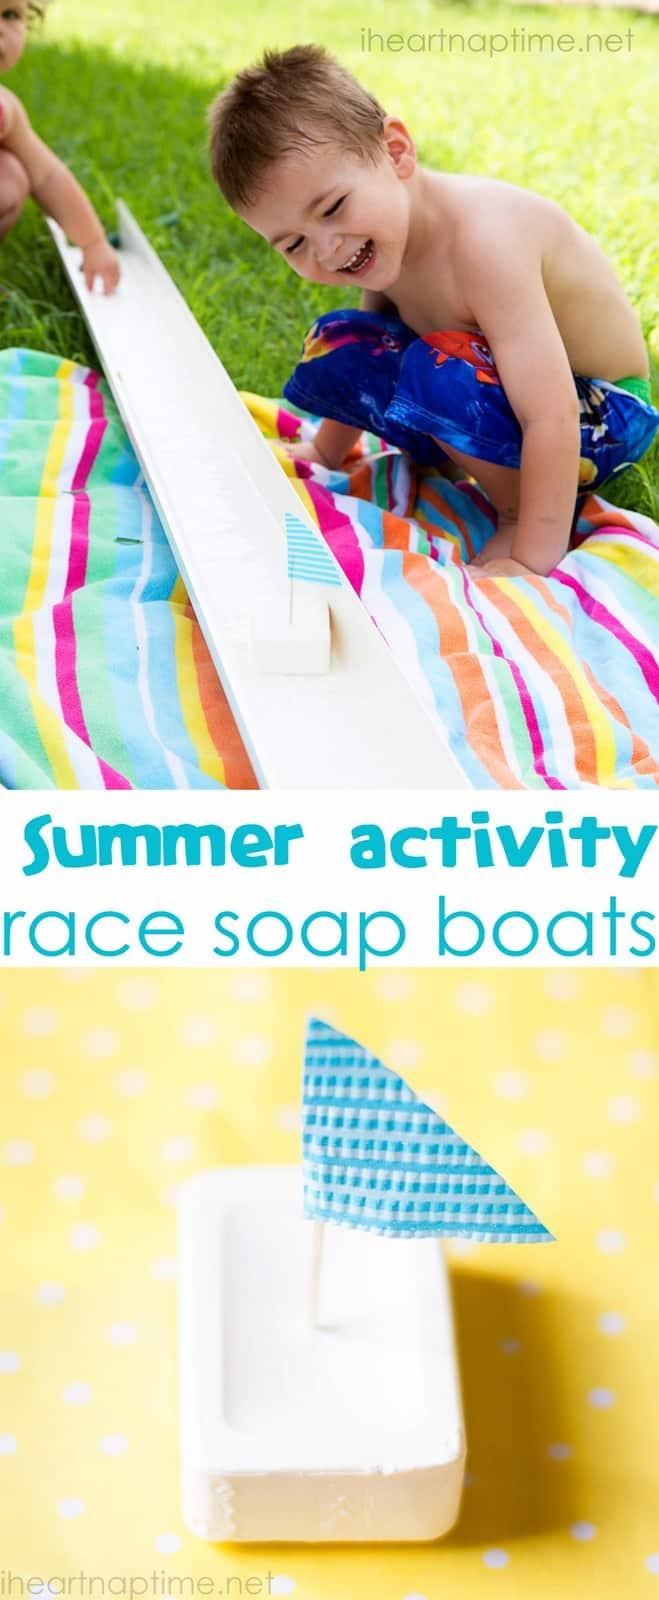 Soap boat races